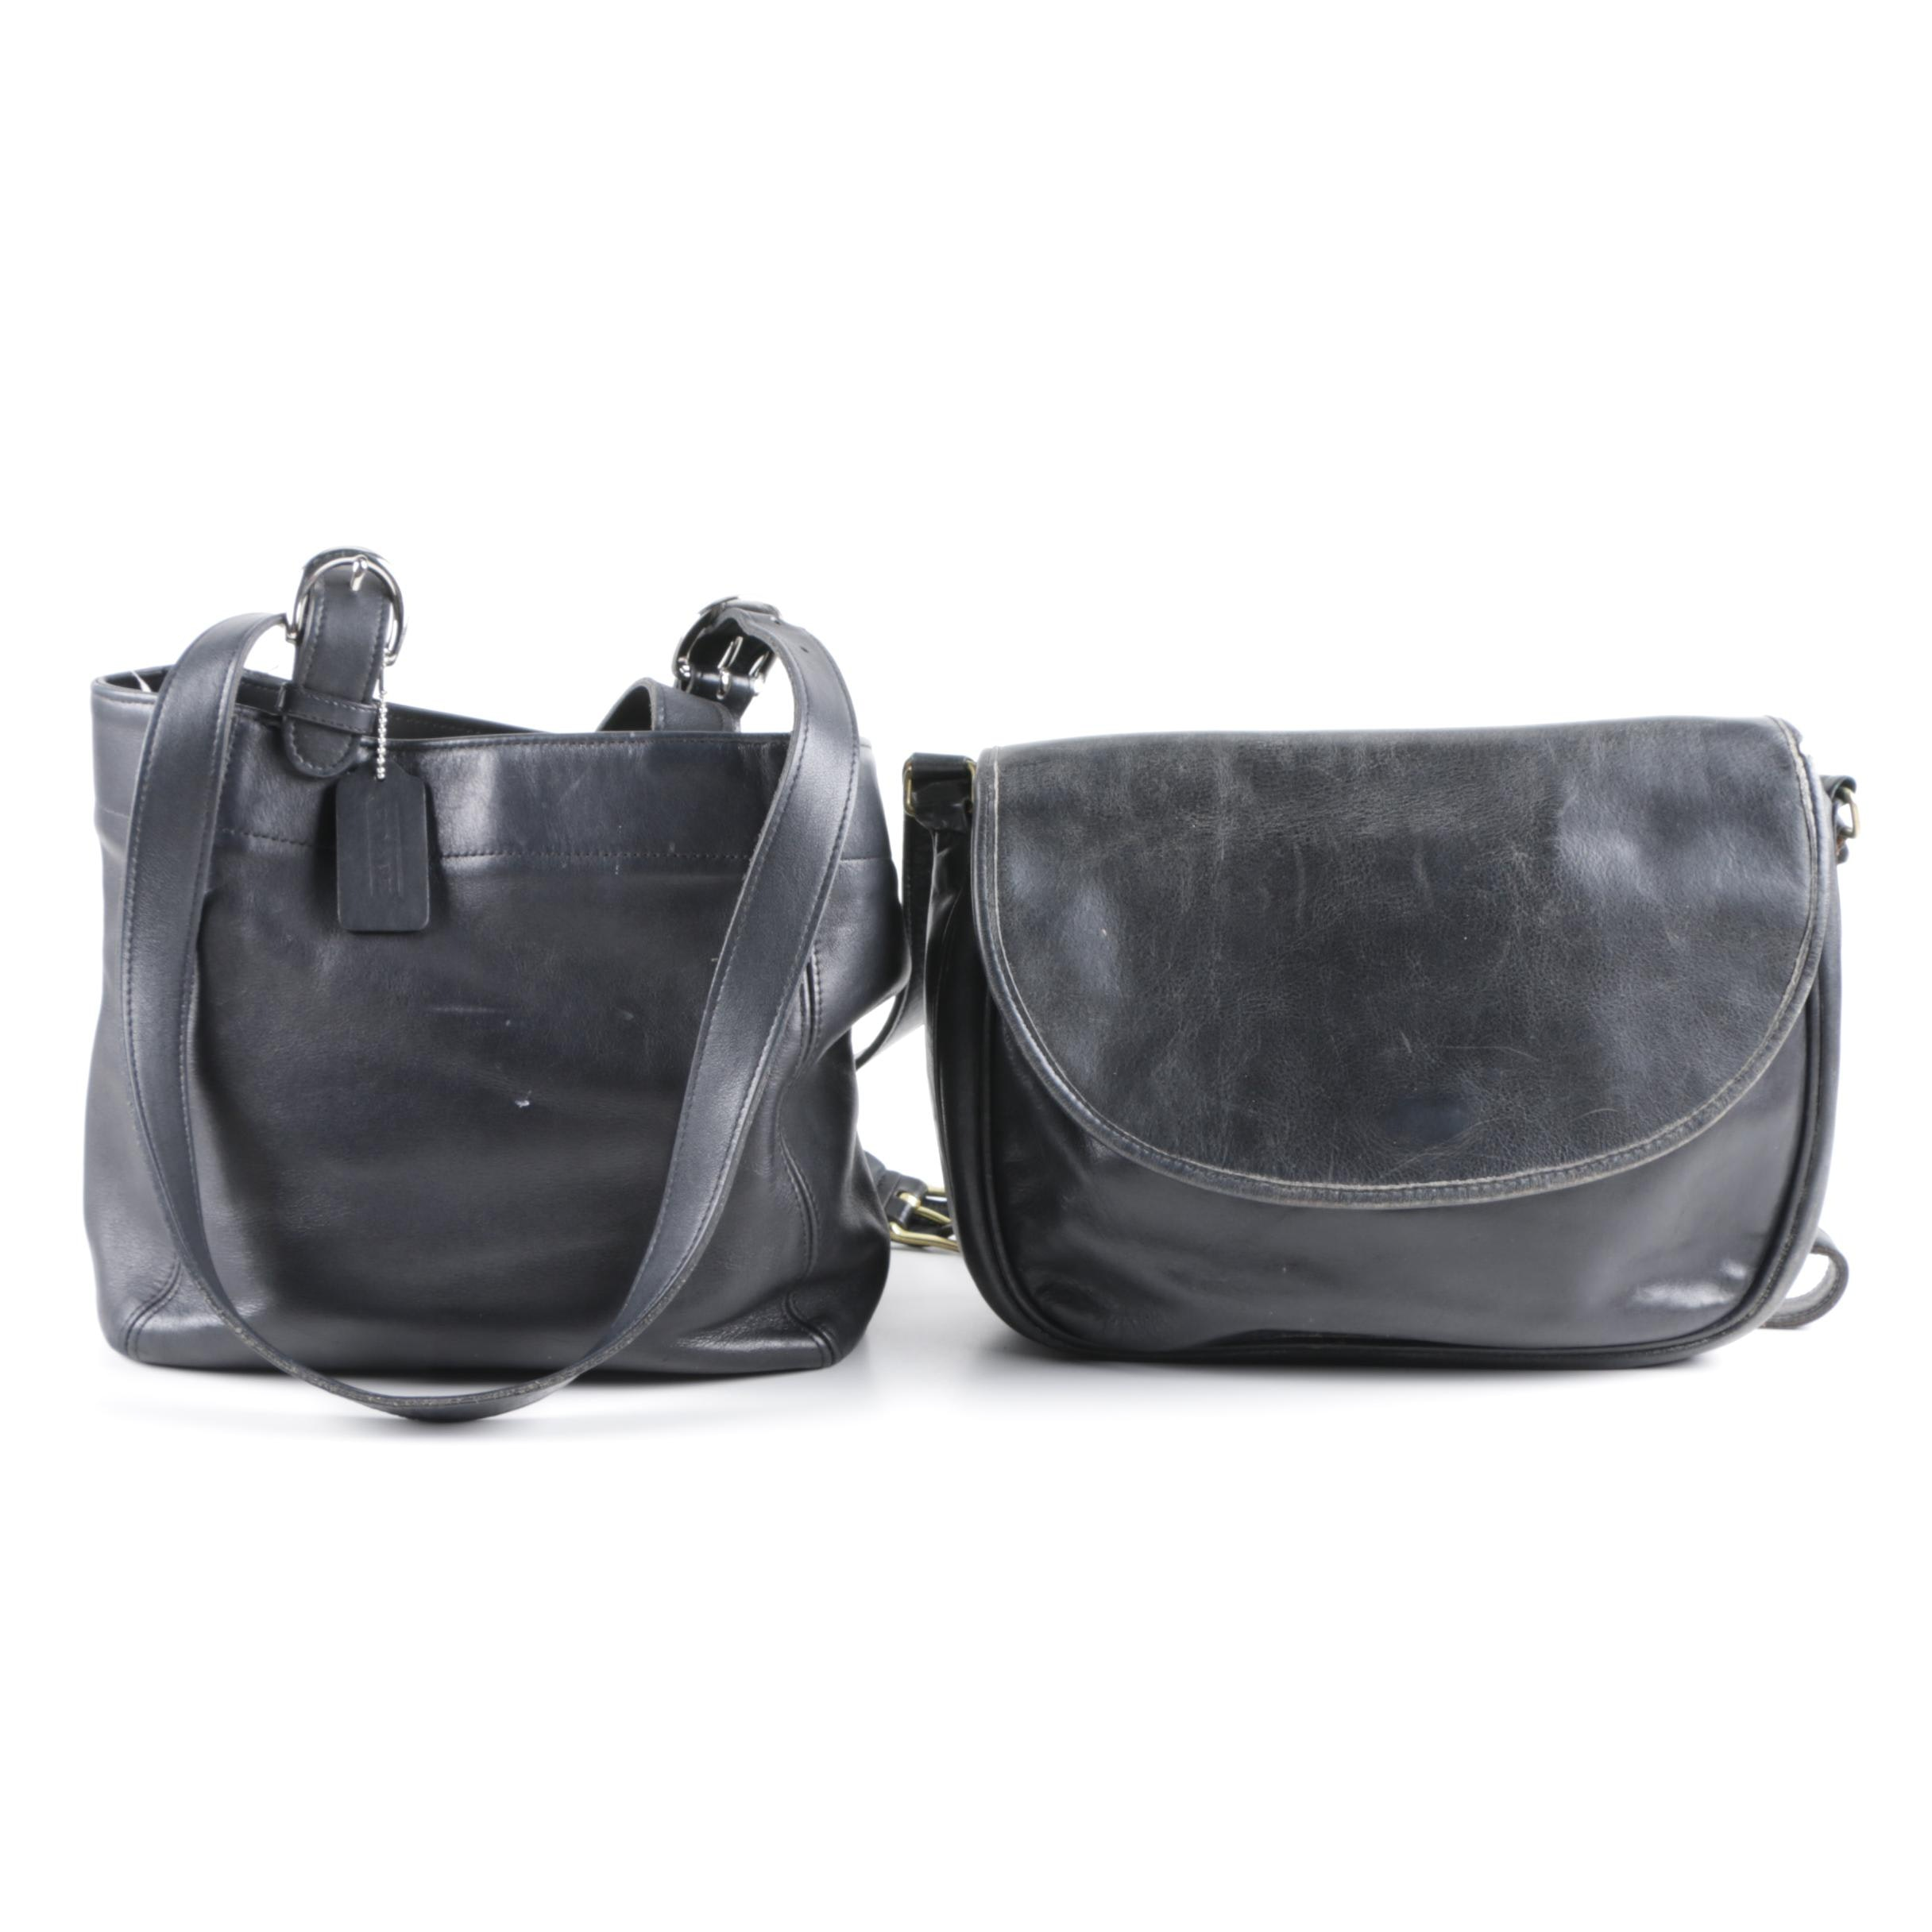 Vintage Coach Black Leather Shoulder Bags